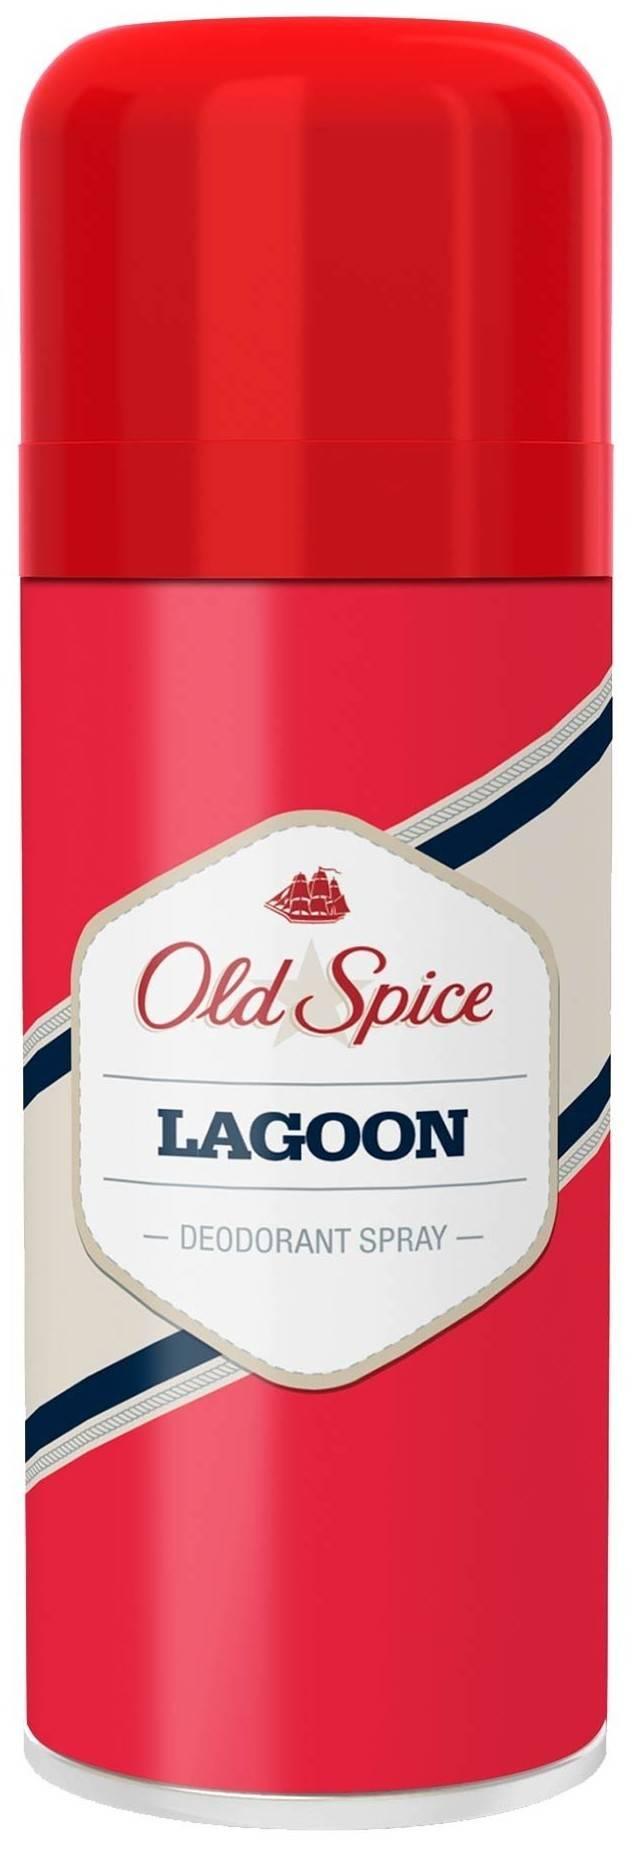 OLD SPICE DEO SPRAY LAGOON 125ML